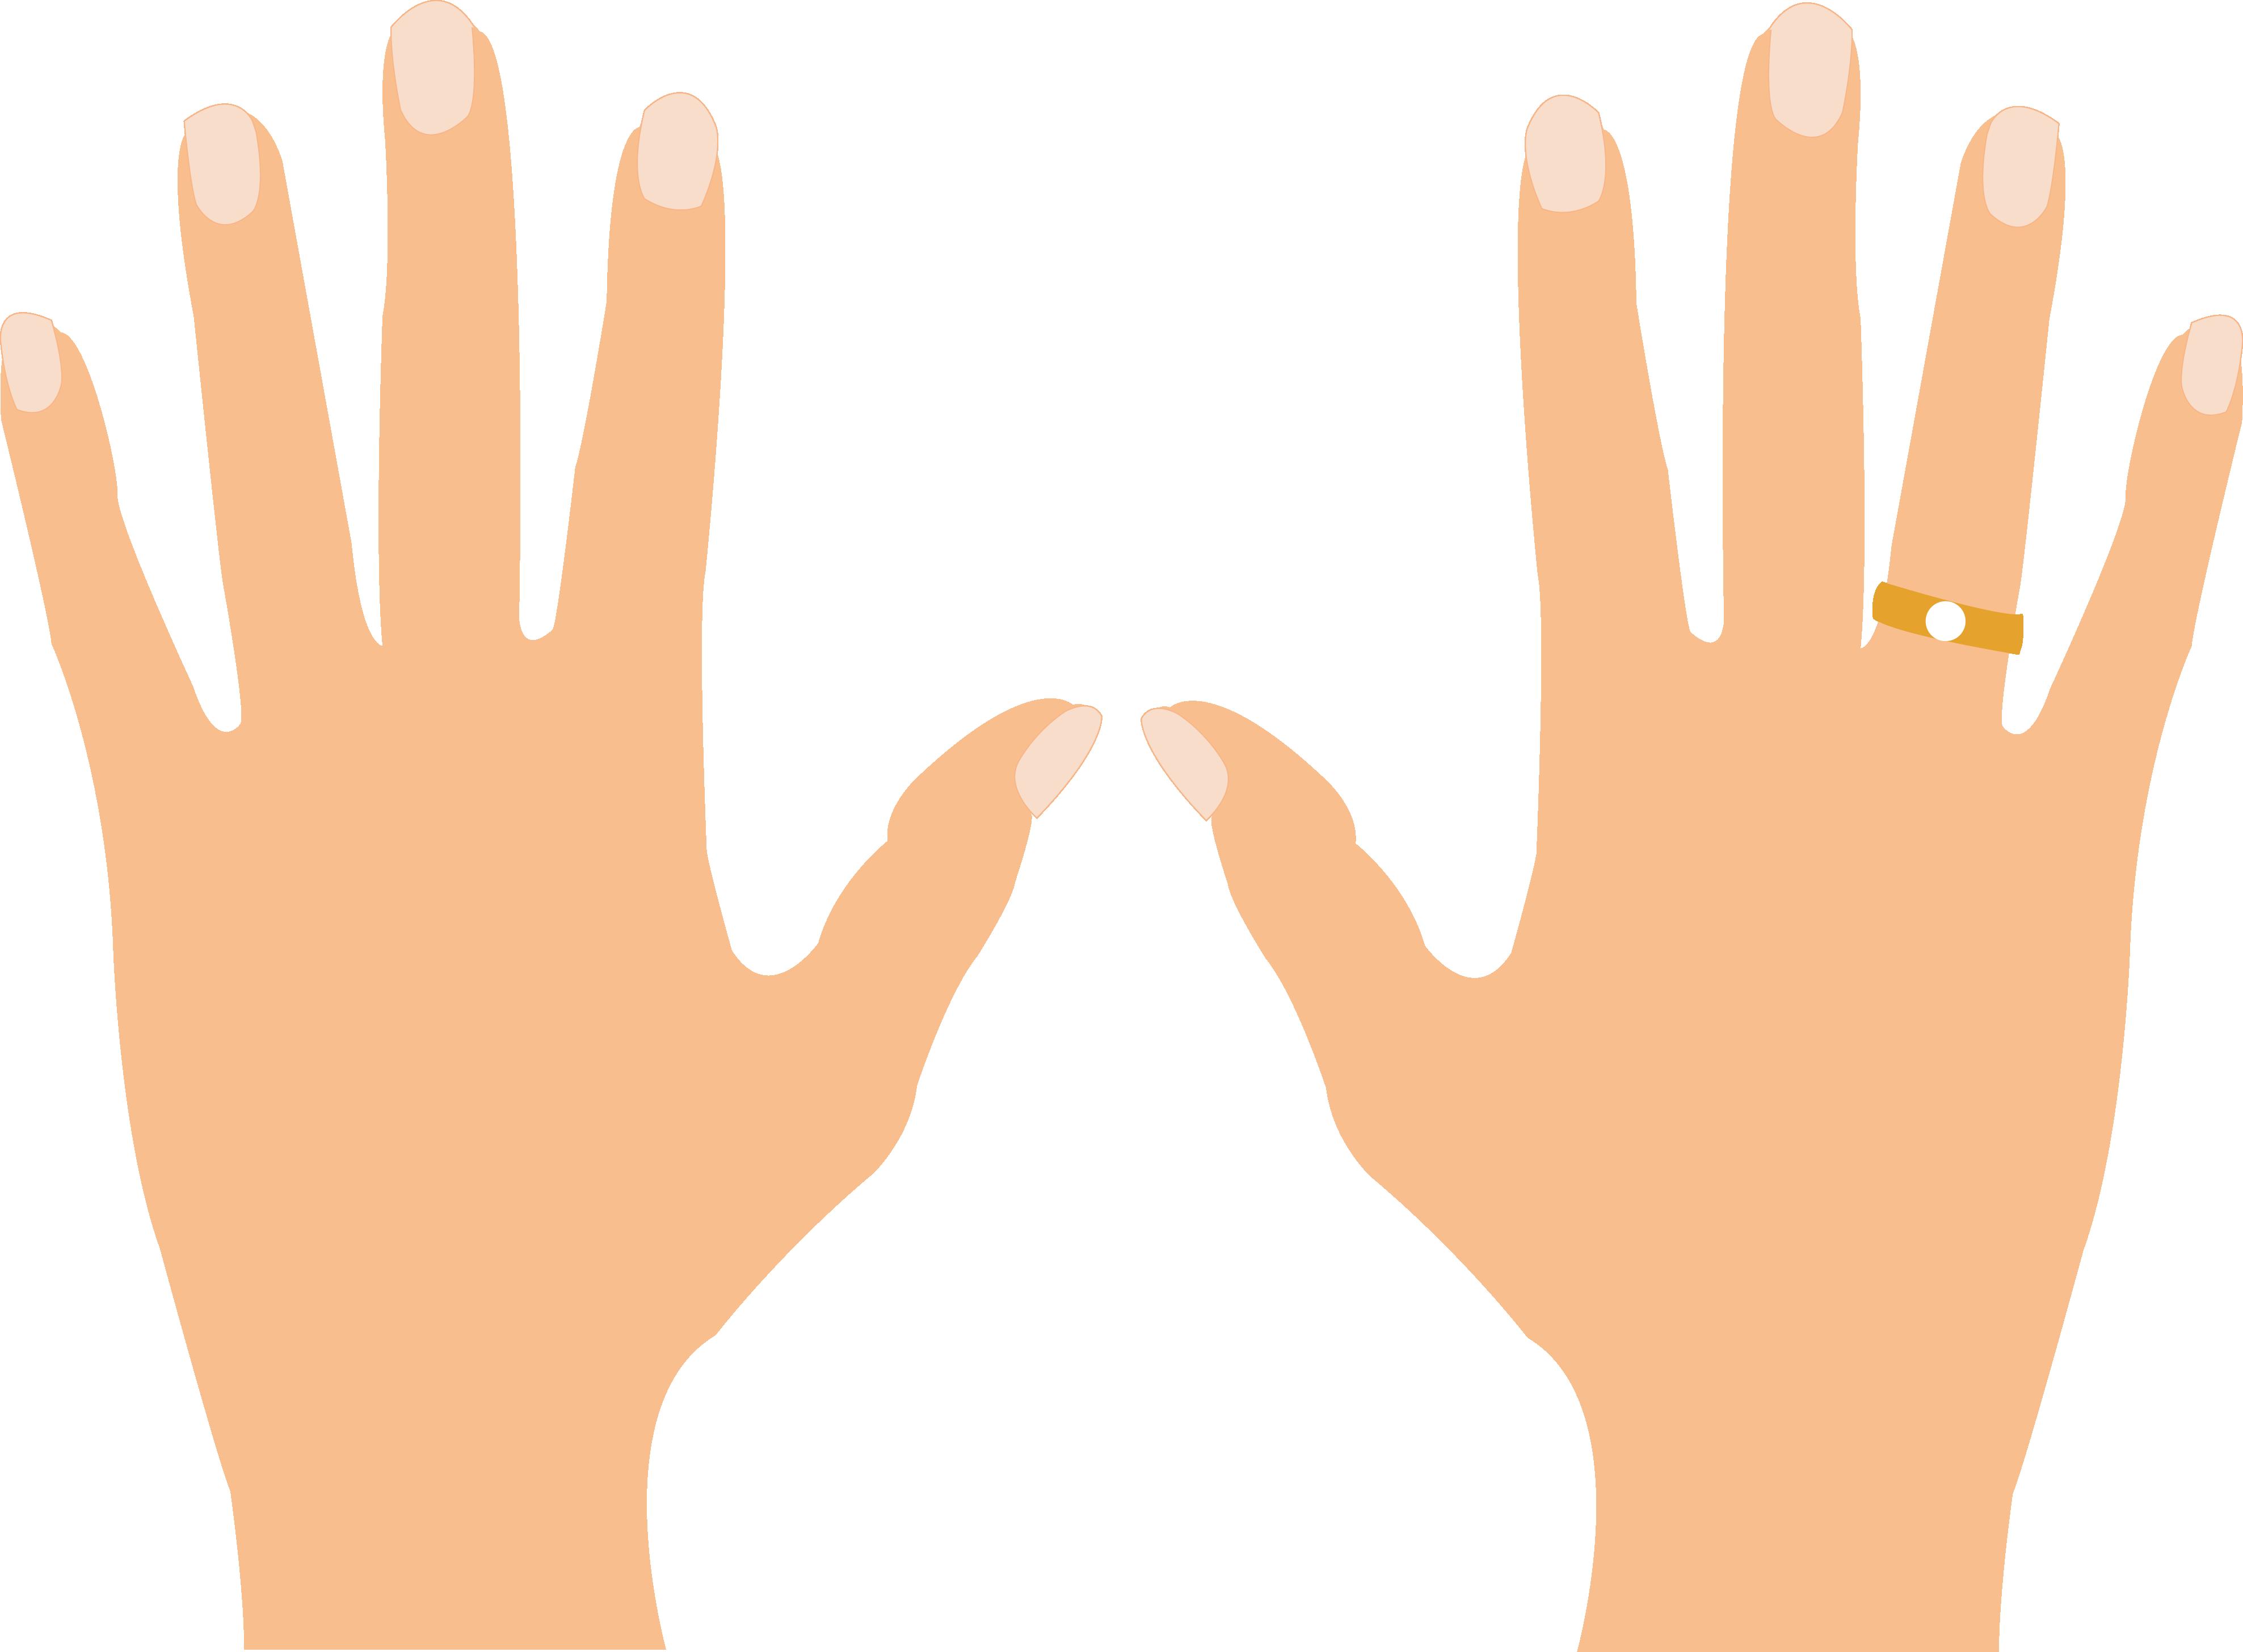 Ehering welcher finger schweiz